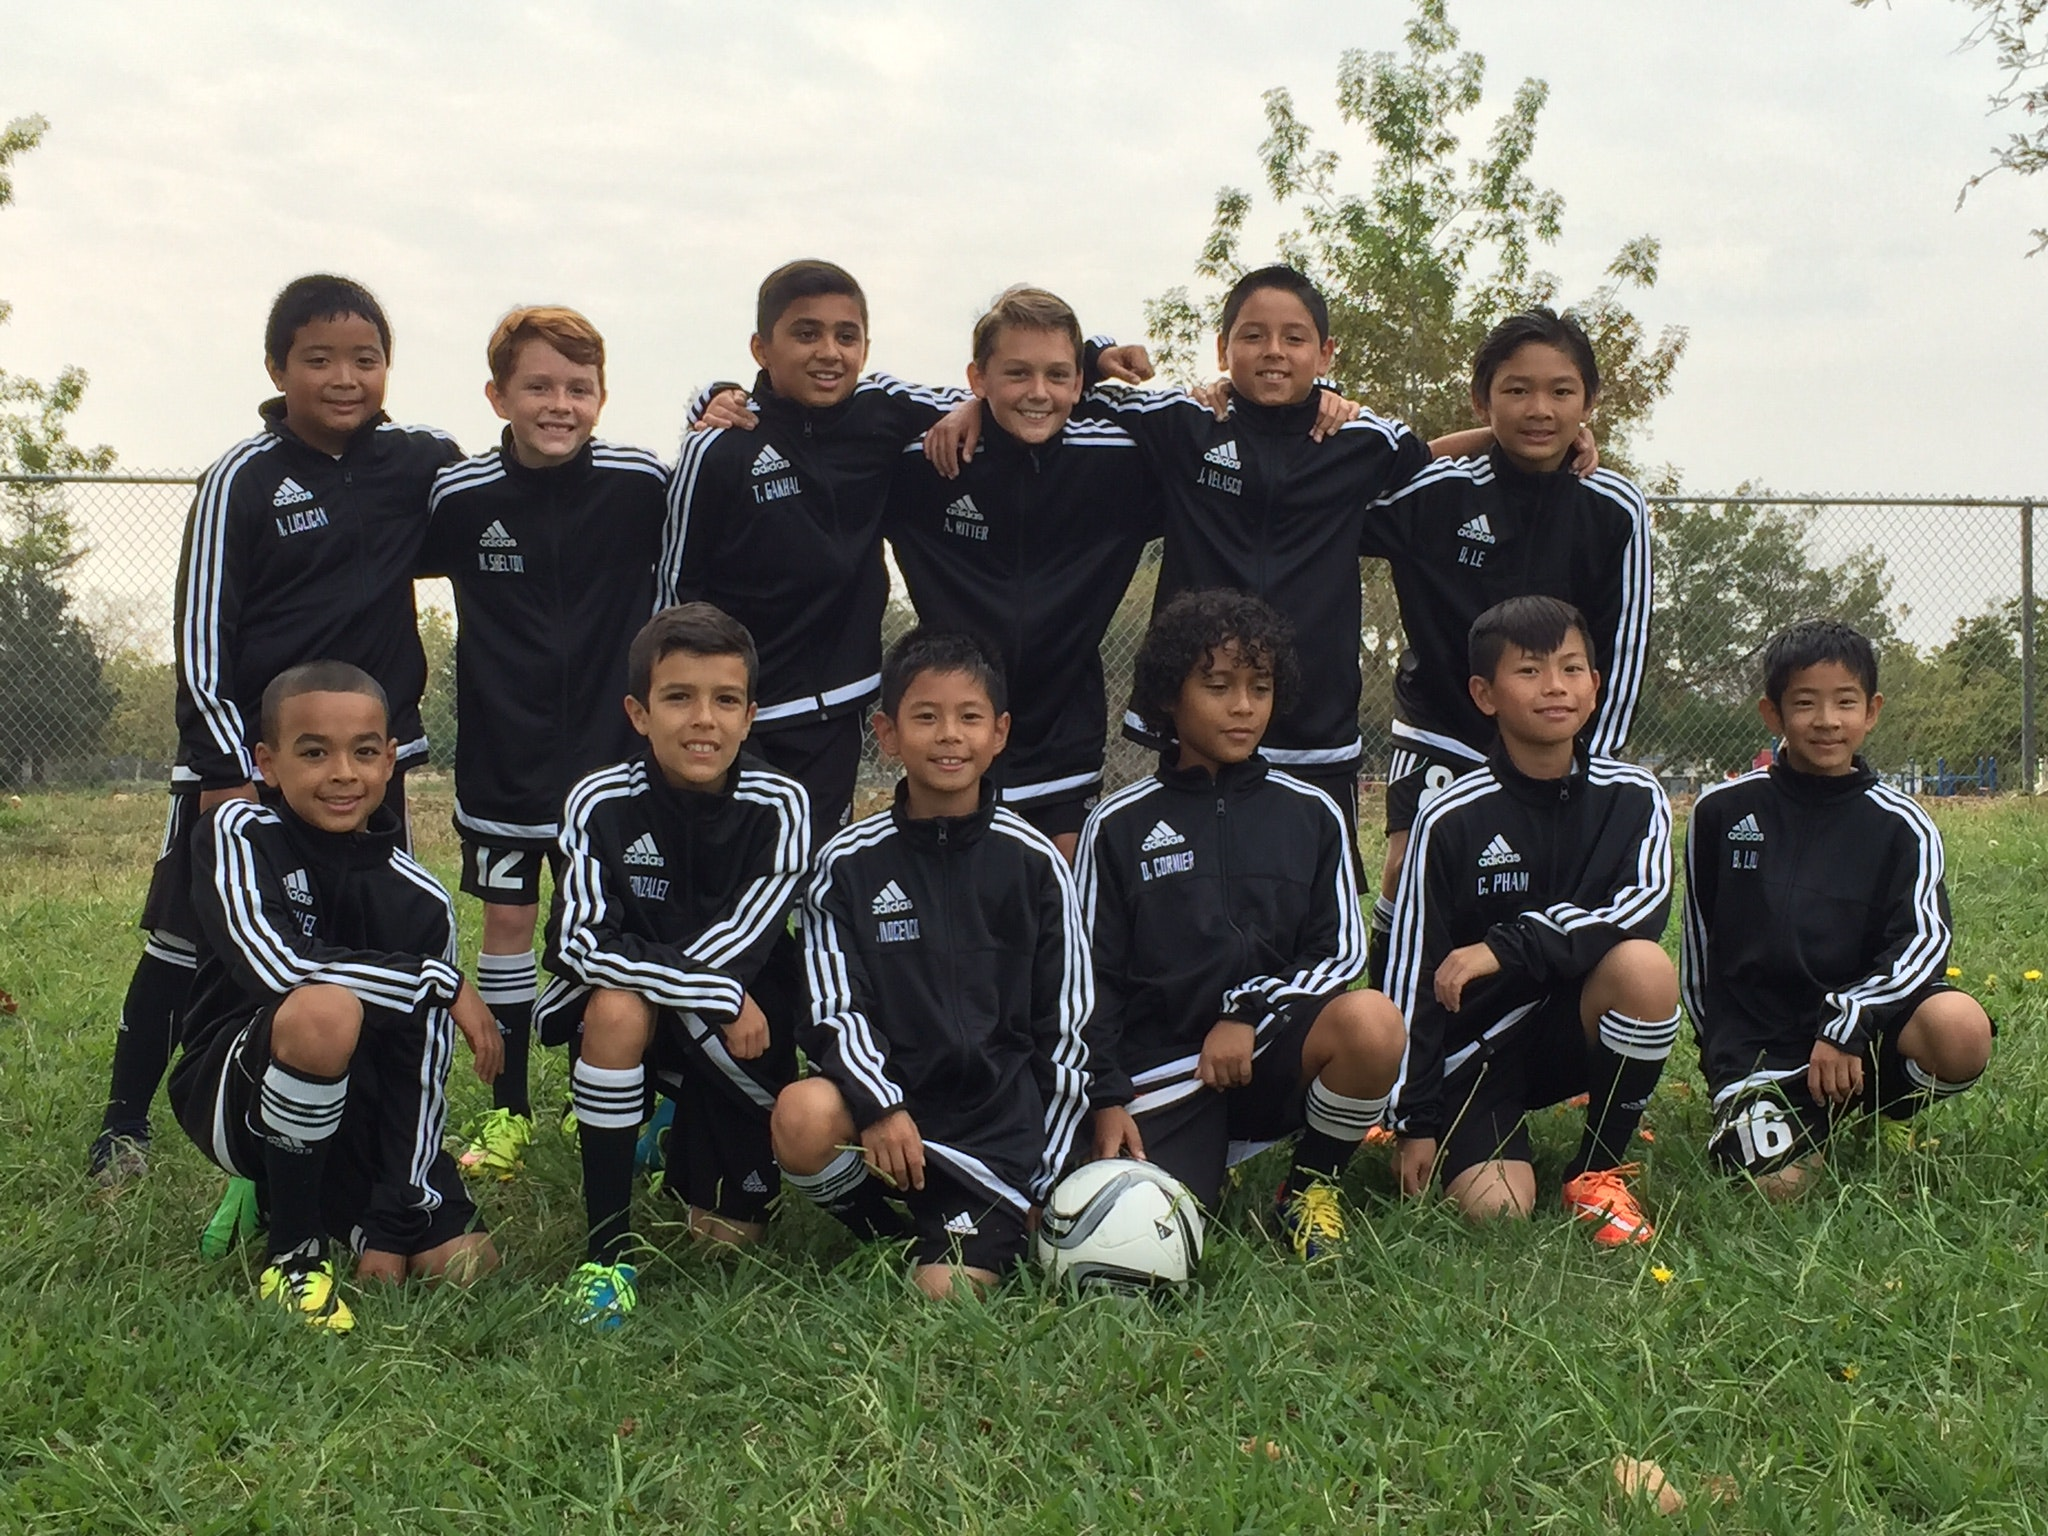 North Valley United 04 Boys